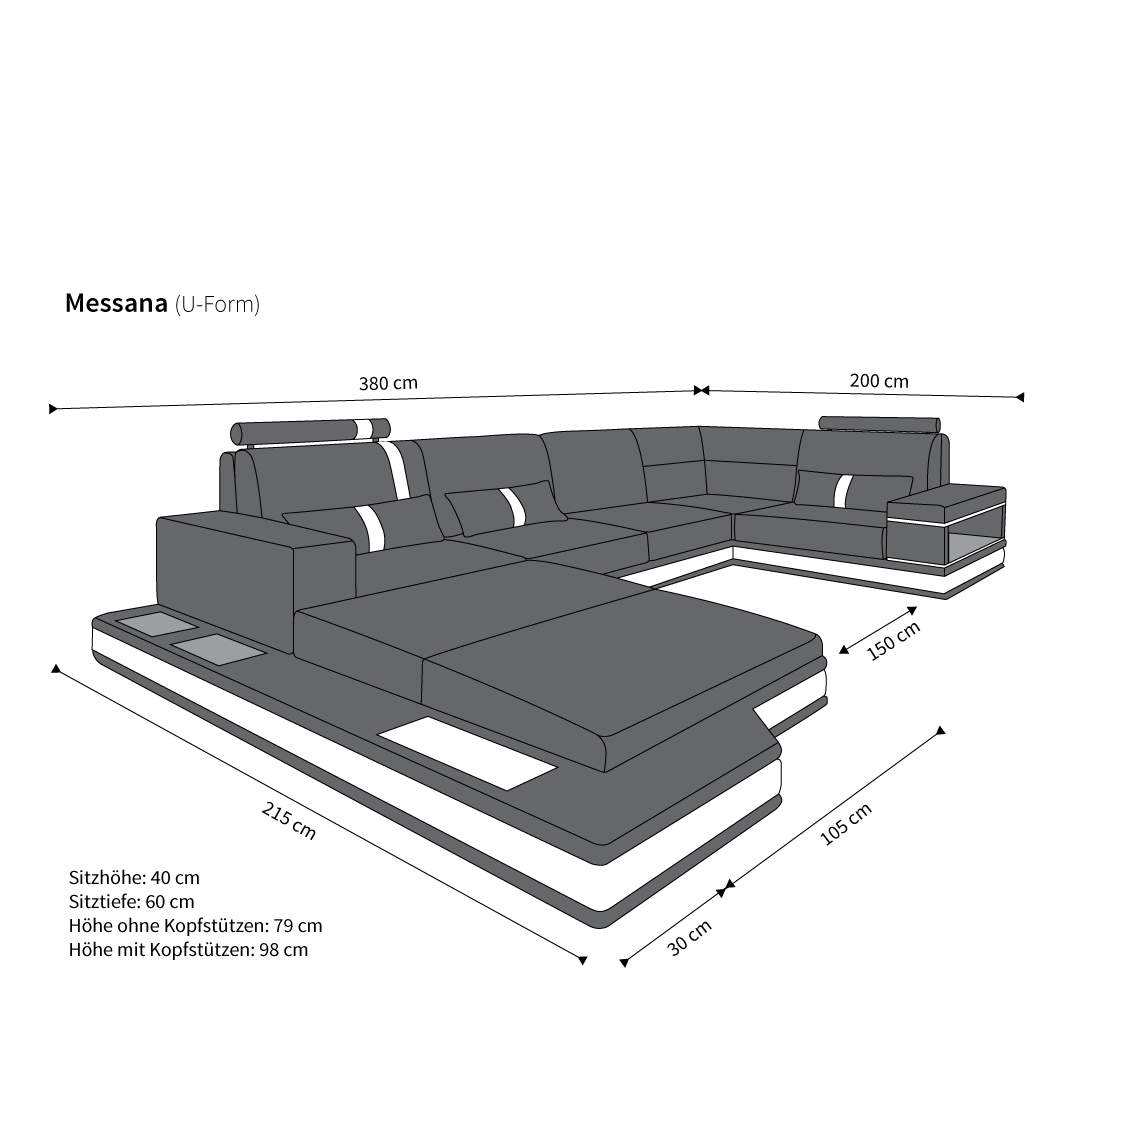 ledersofa wohnlandschaft messana weiss schwarz kaufen bei pmr handelsgesellschaft mbh. Black Bedroom Furniture Sets. Home Design Ideas